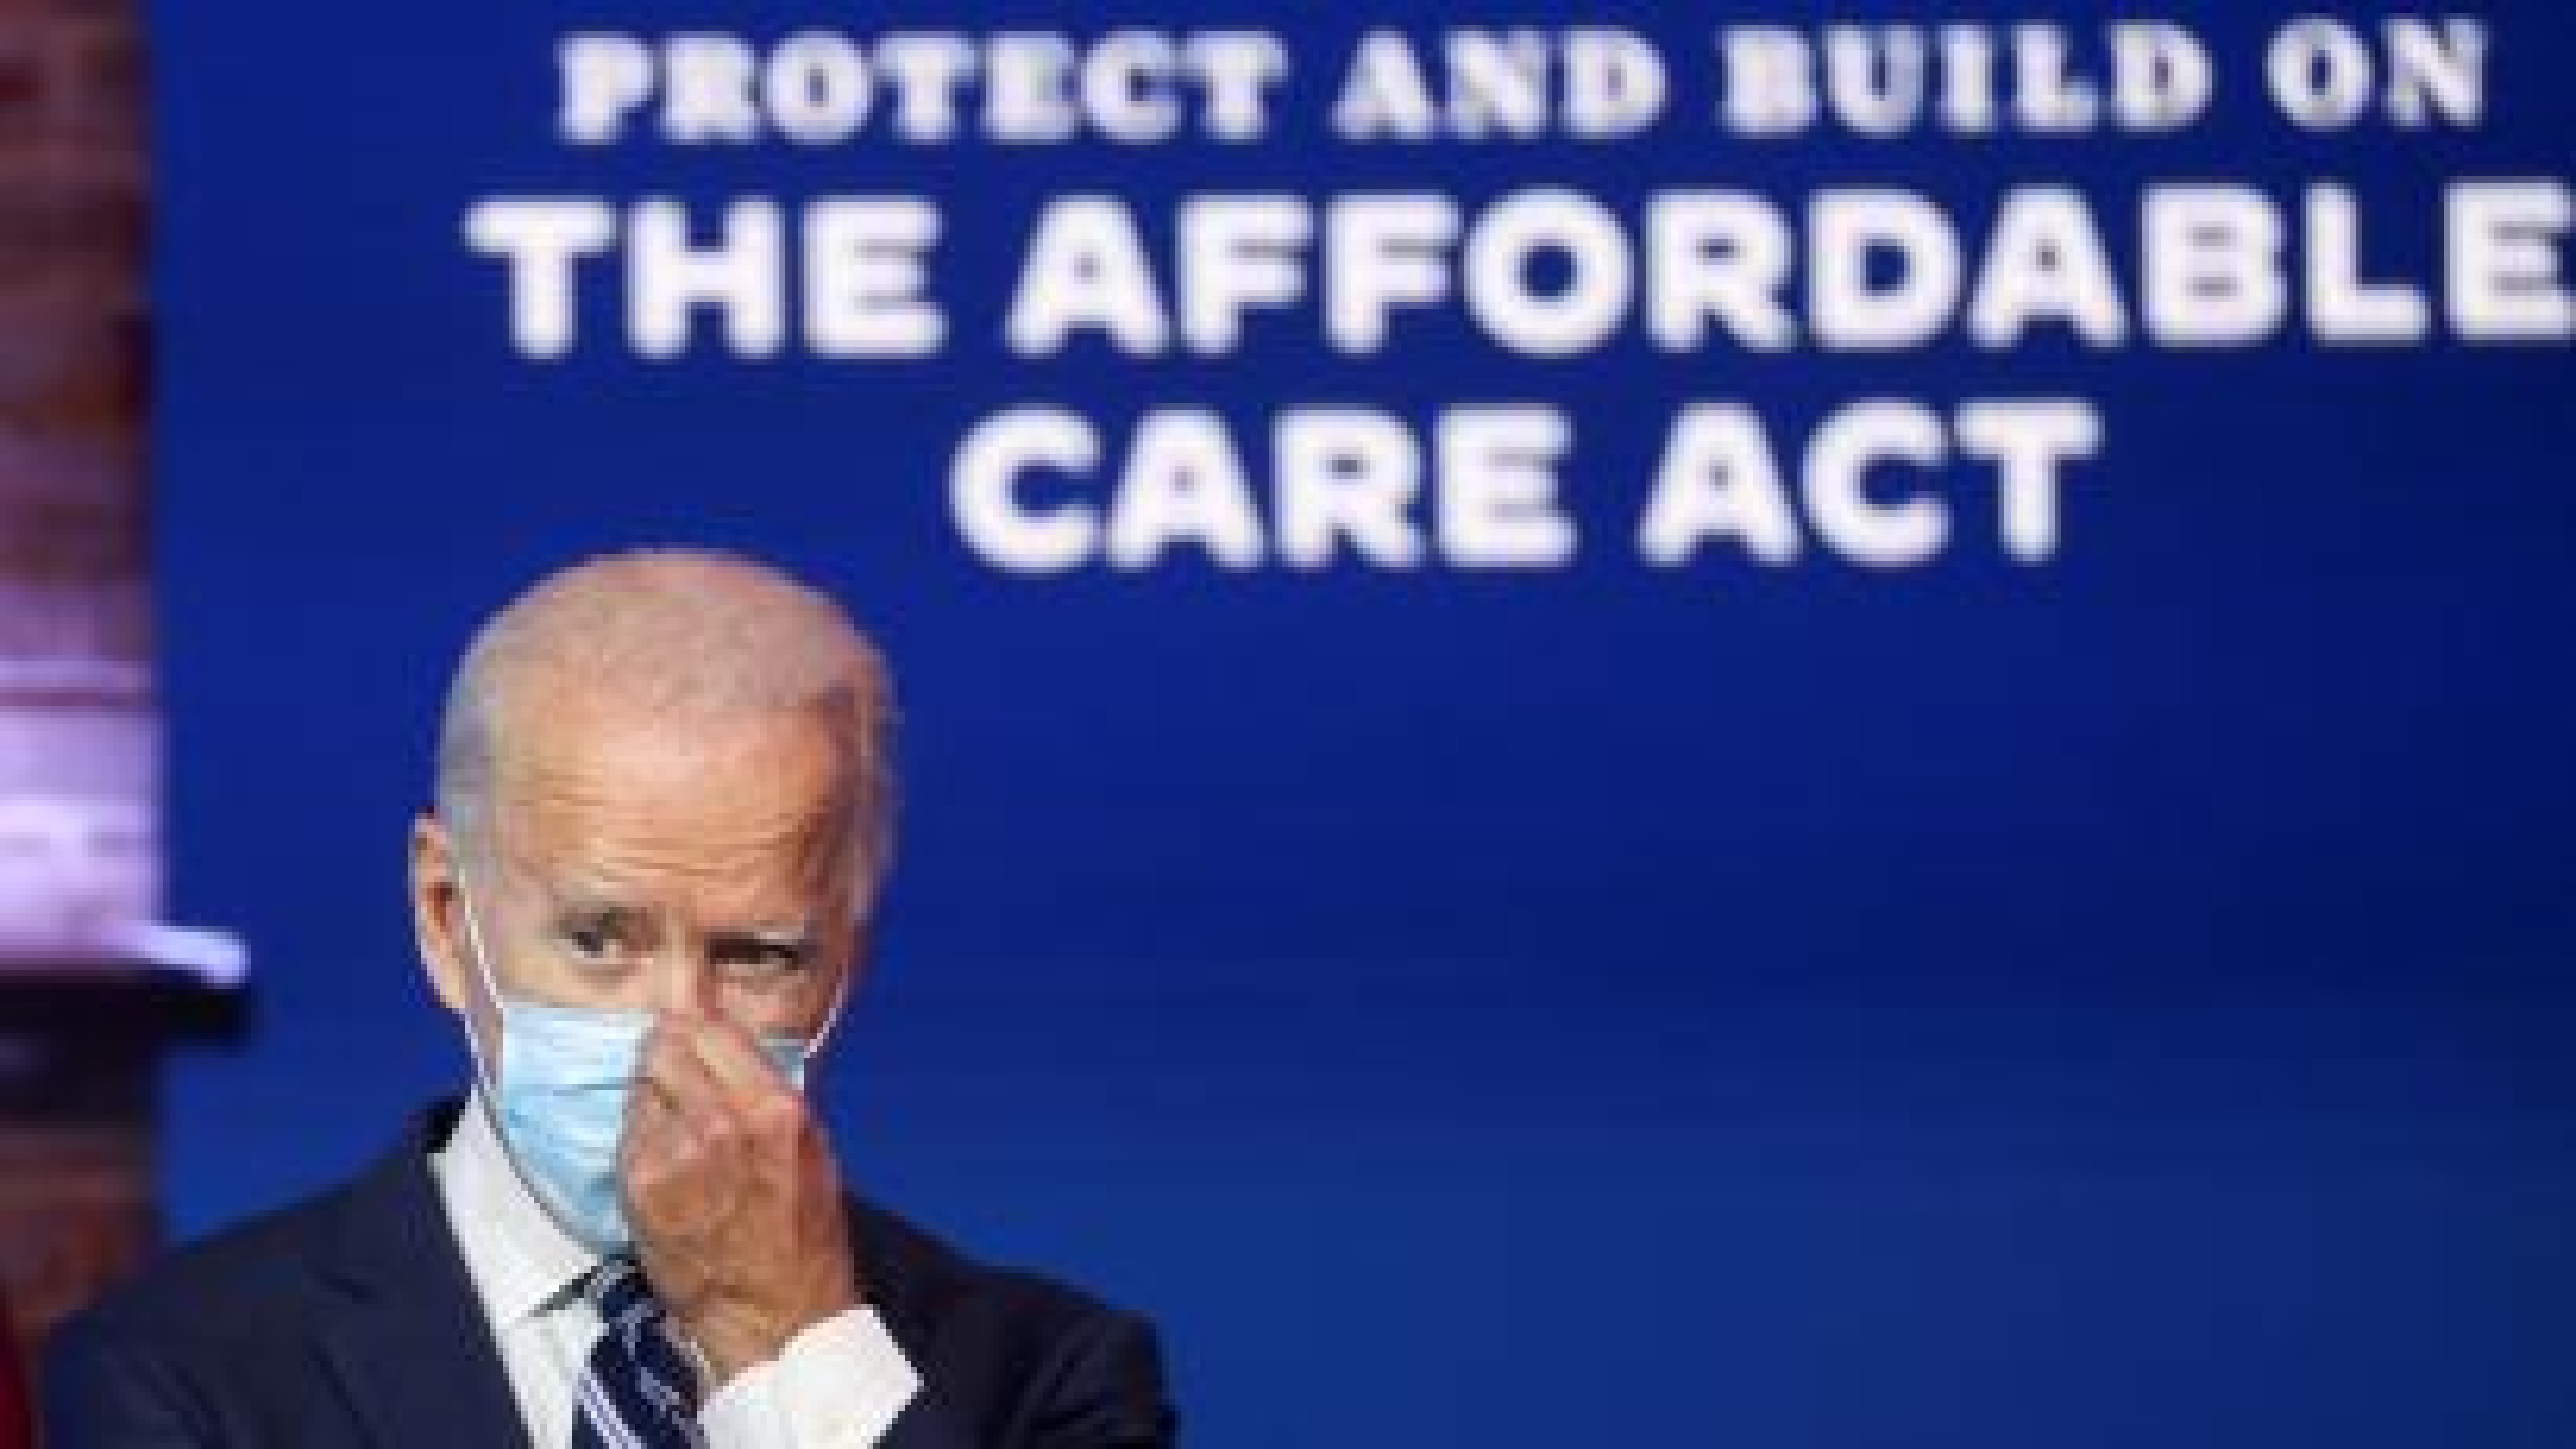 U.S. President Biden holds news conference in Wilmington, Delaware